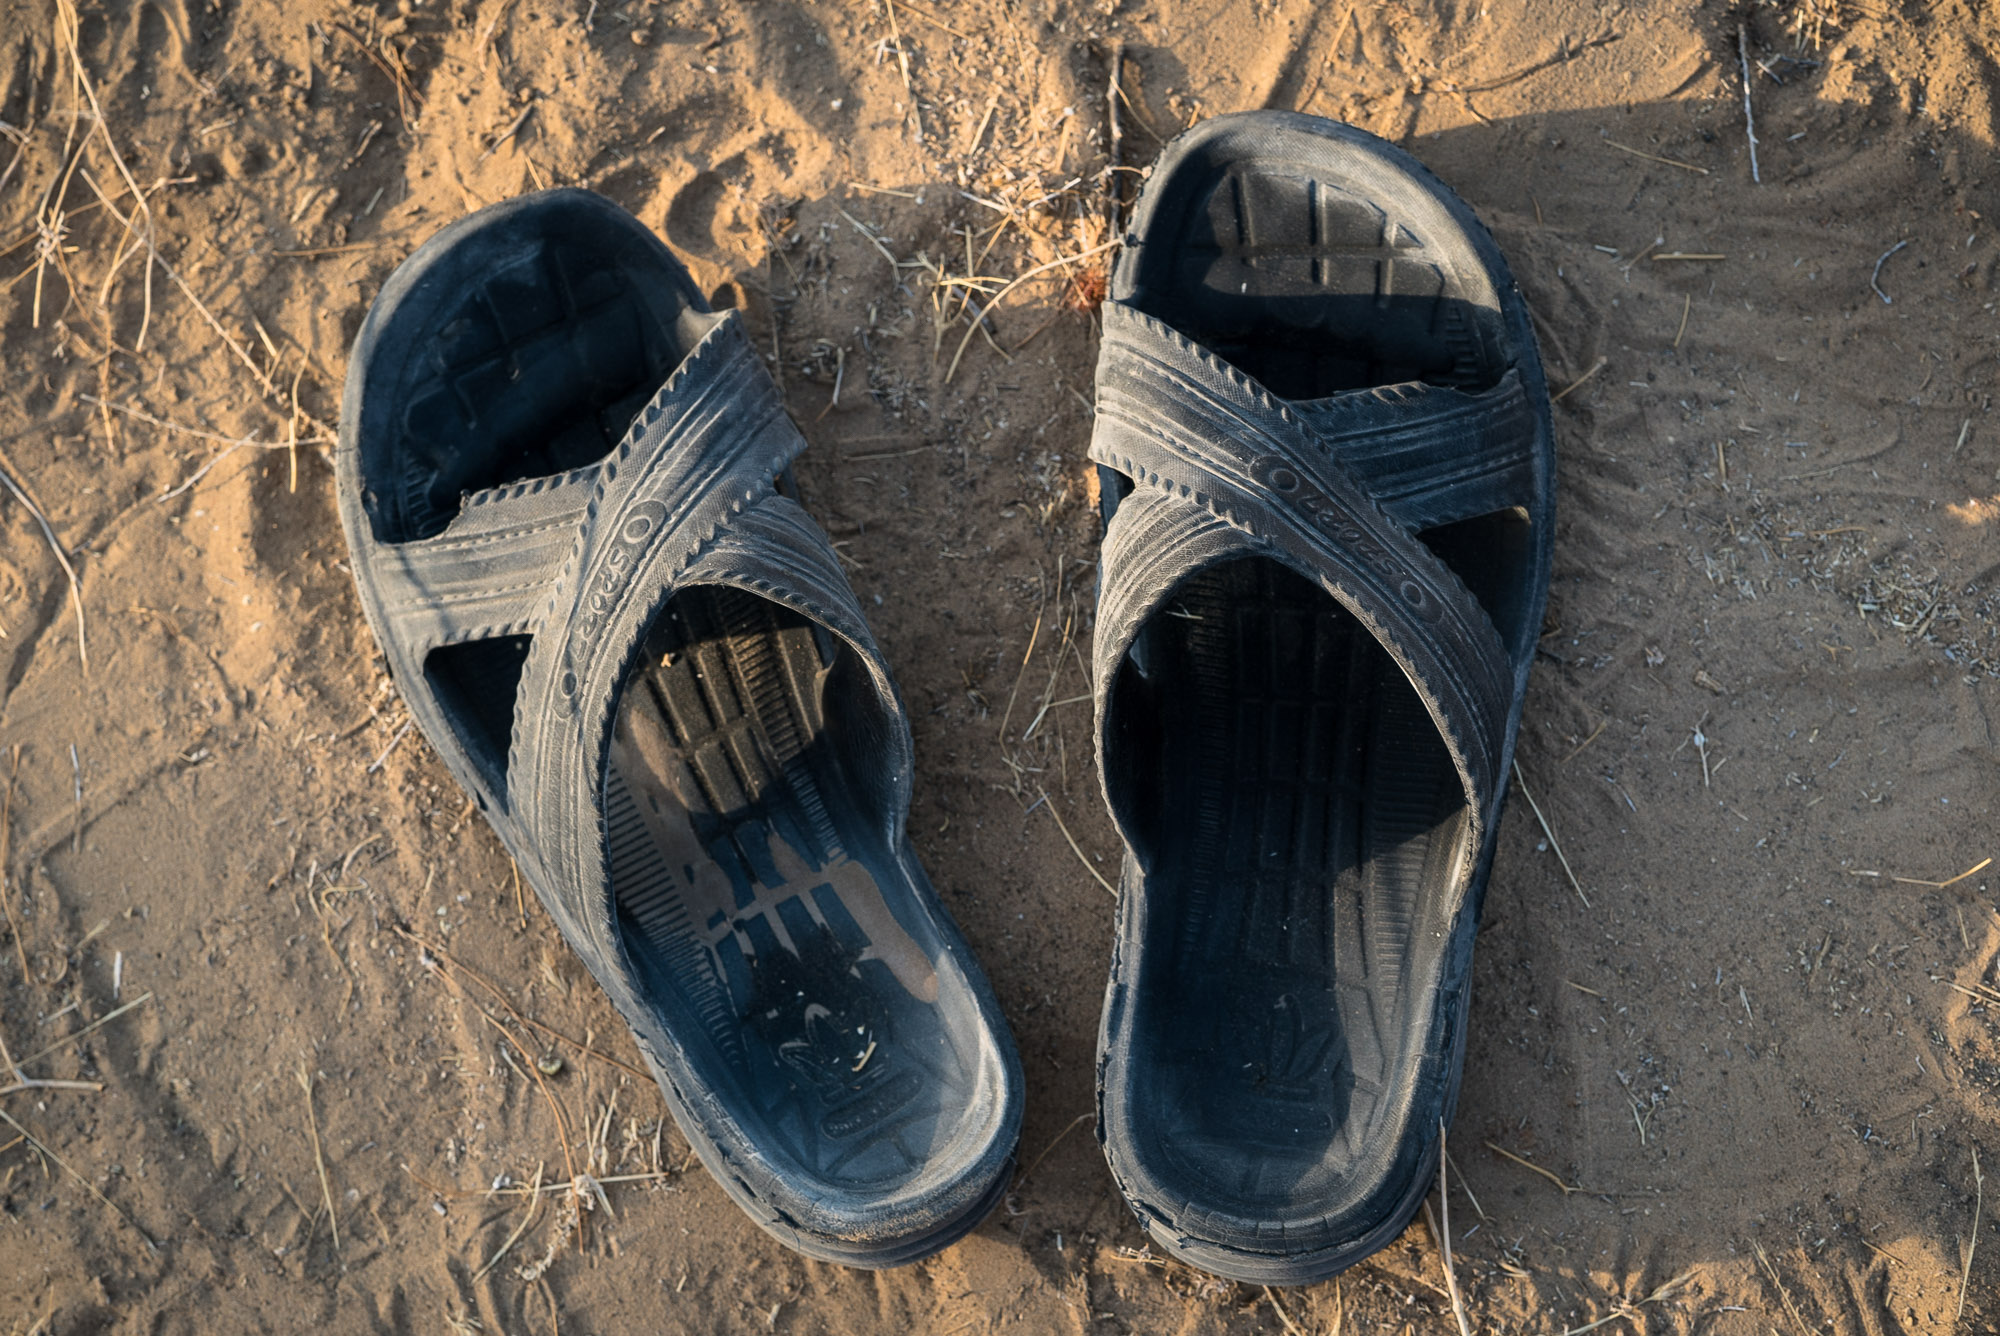 the Kazakh slippers